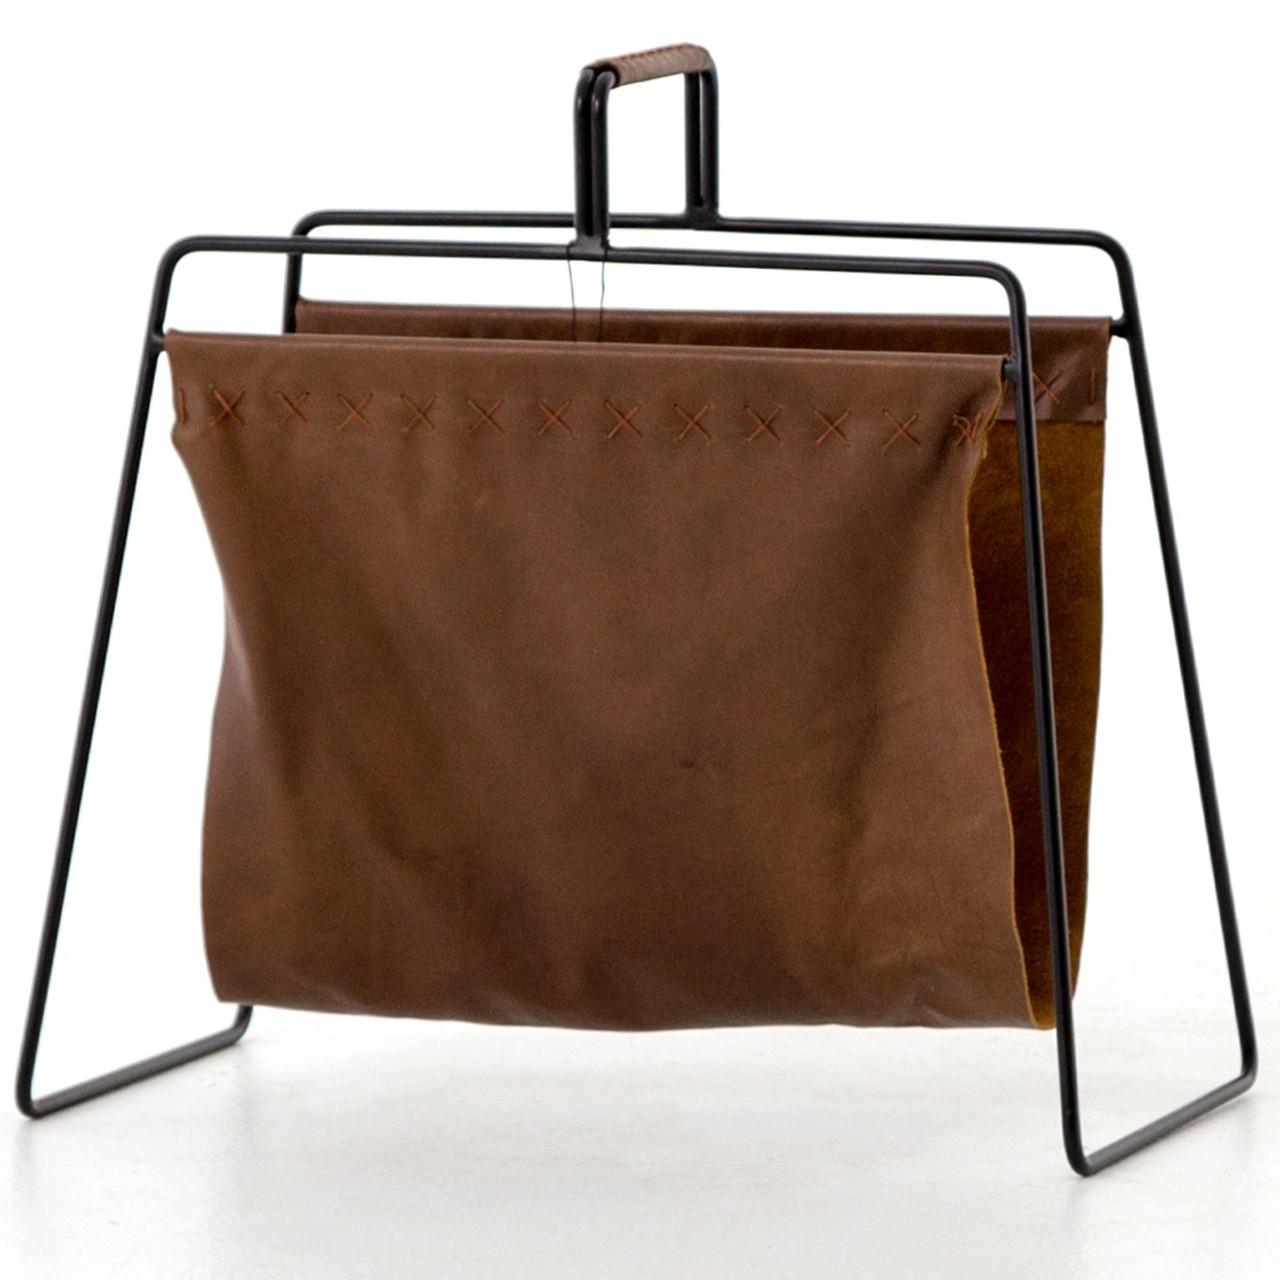 Groovy Aesop Brown Leather Magazine Rack Download Free Architecture Designs Scobabritishbridgeorg